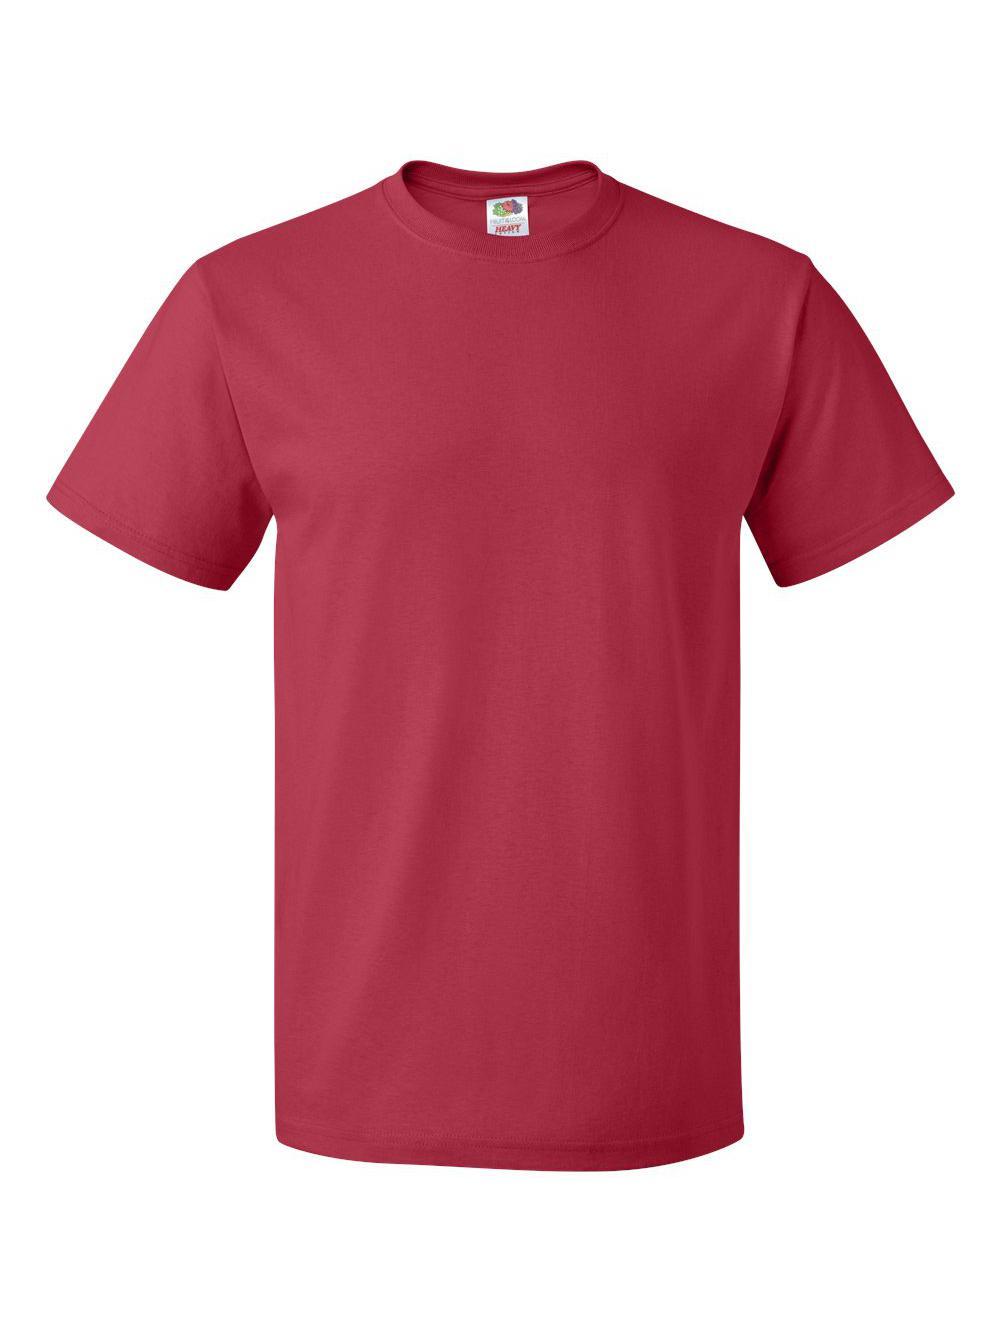 Fruit-of-the-Loom-HD-Cotton-Short-Sleeve-T-Shirt-3930R thumbnail 132